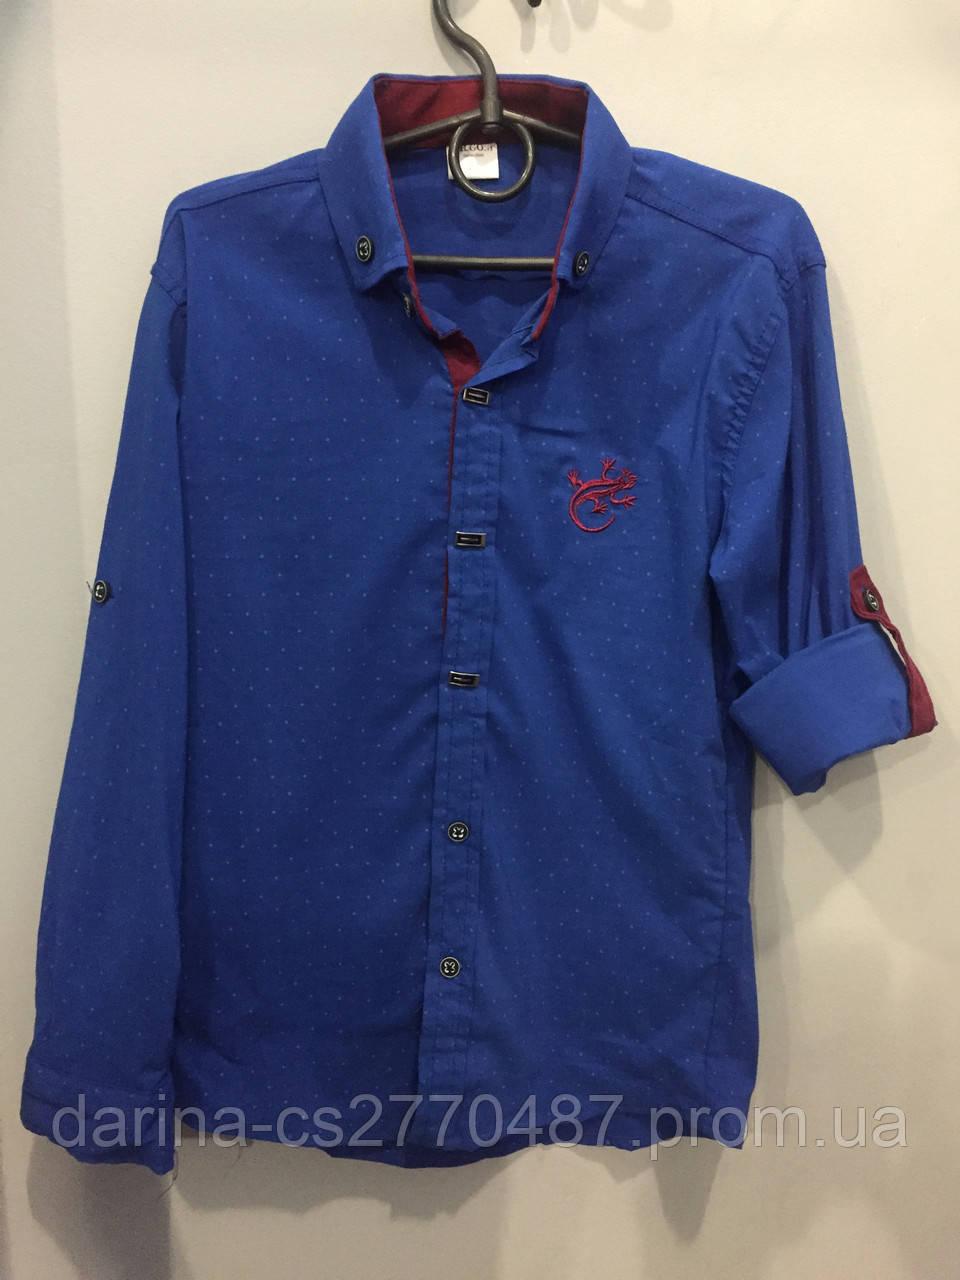 Рубашка на мальчика рукав трансформер 10,12 л